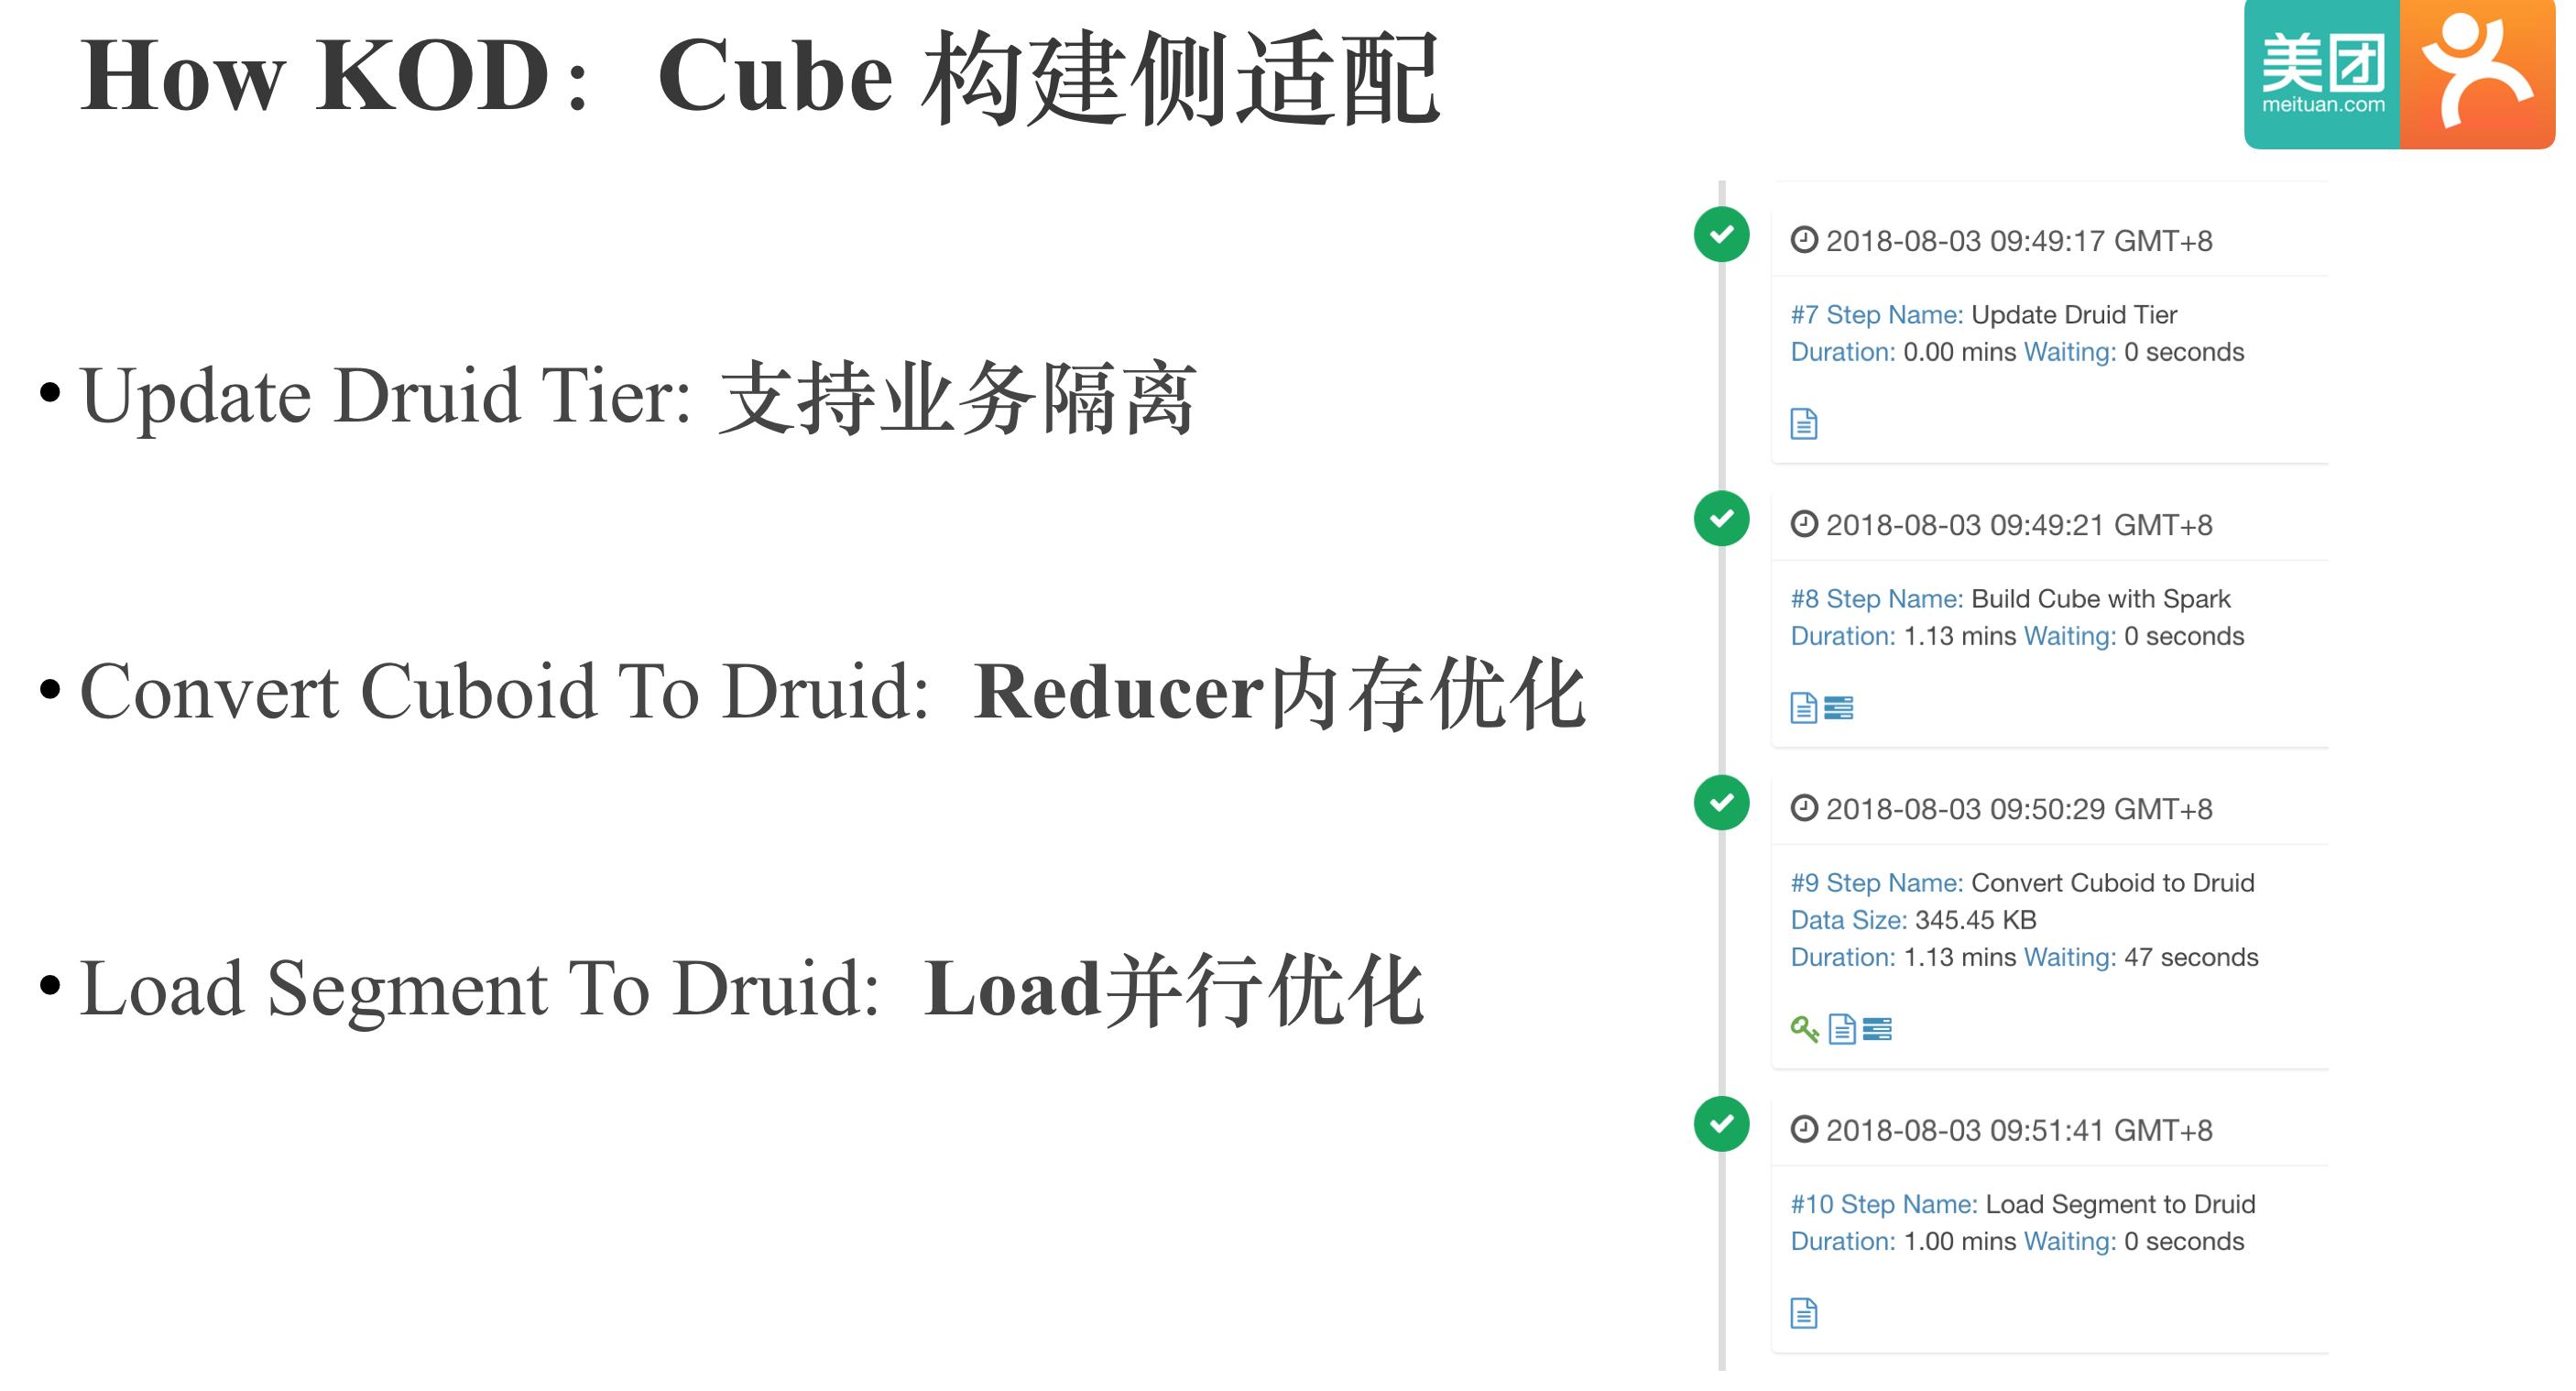 How KOD:Cube 构建侧适配